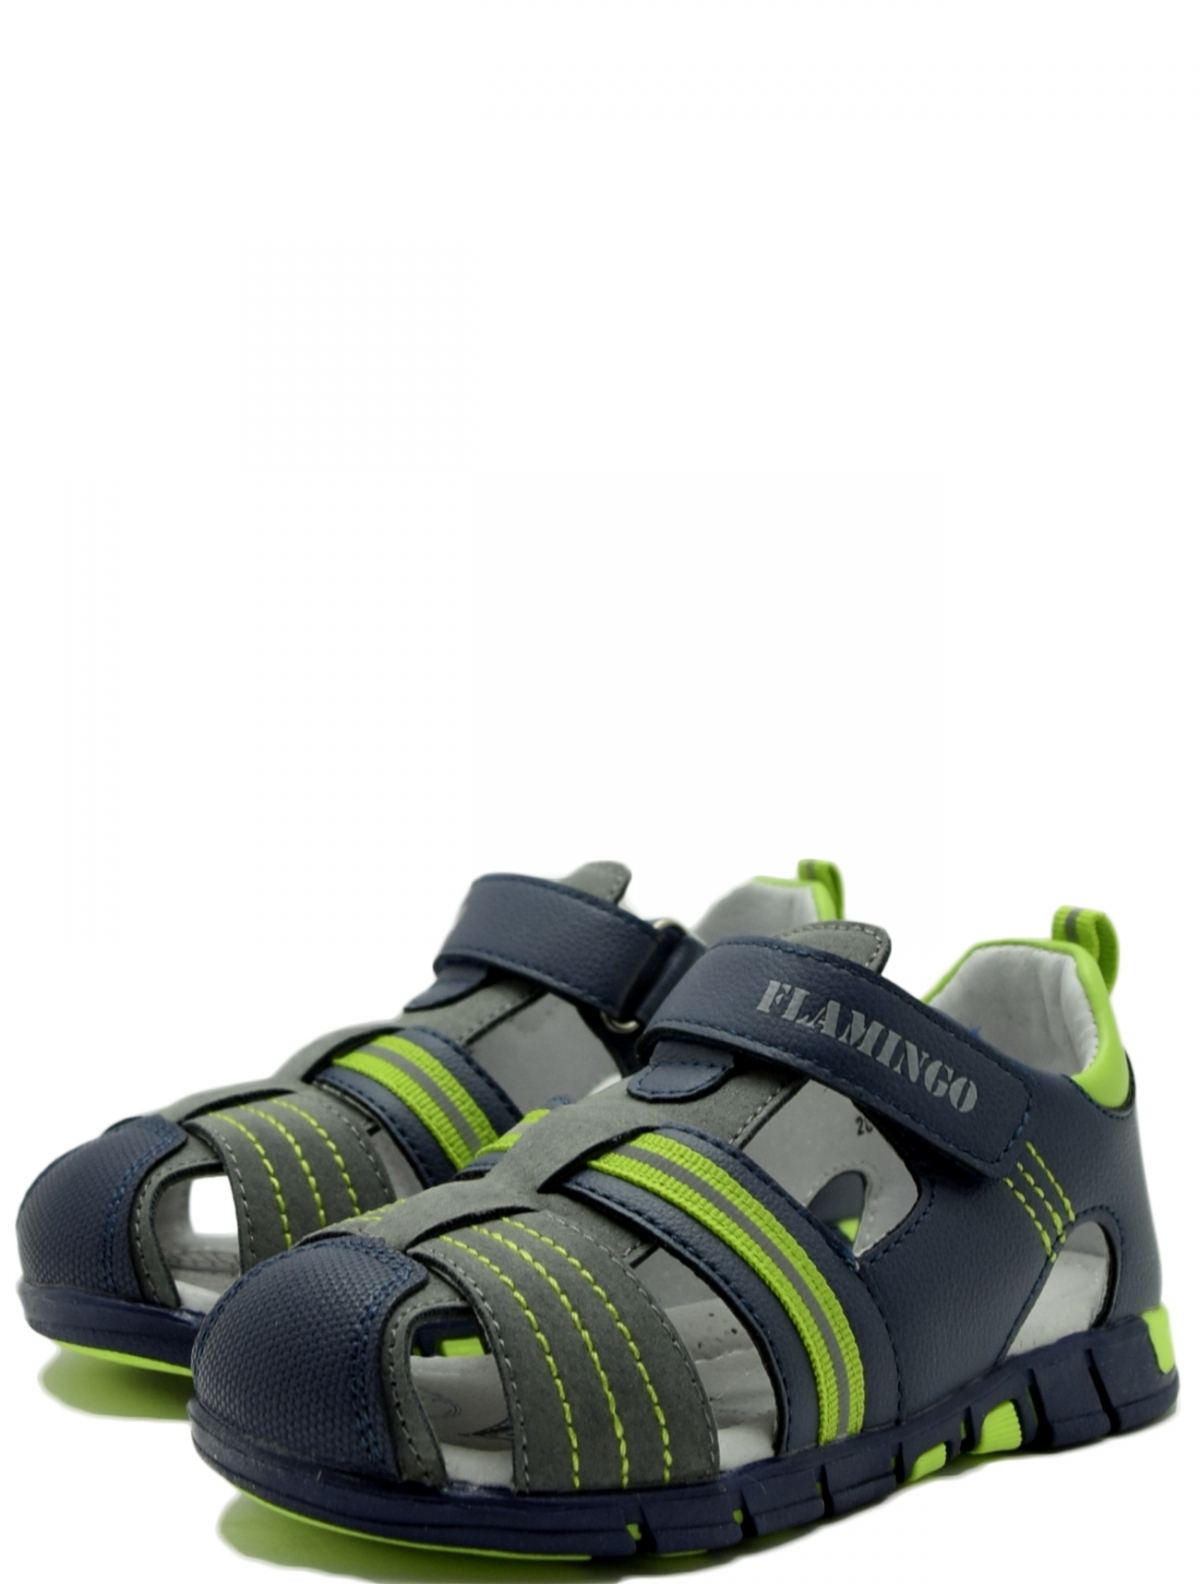 Flamingo 201S-HL-1762 сандали для мальчика